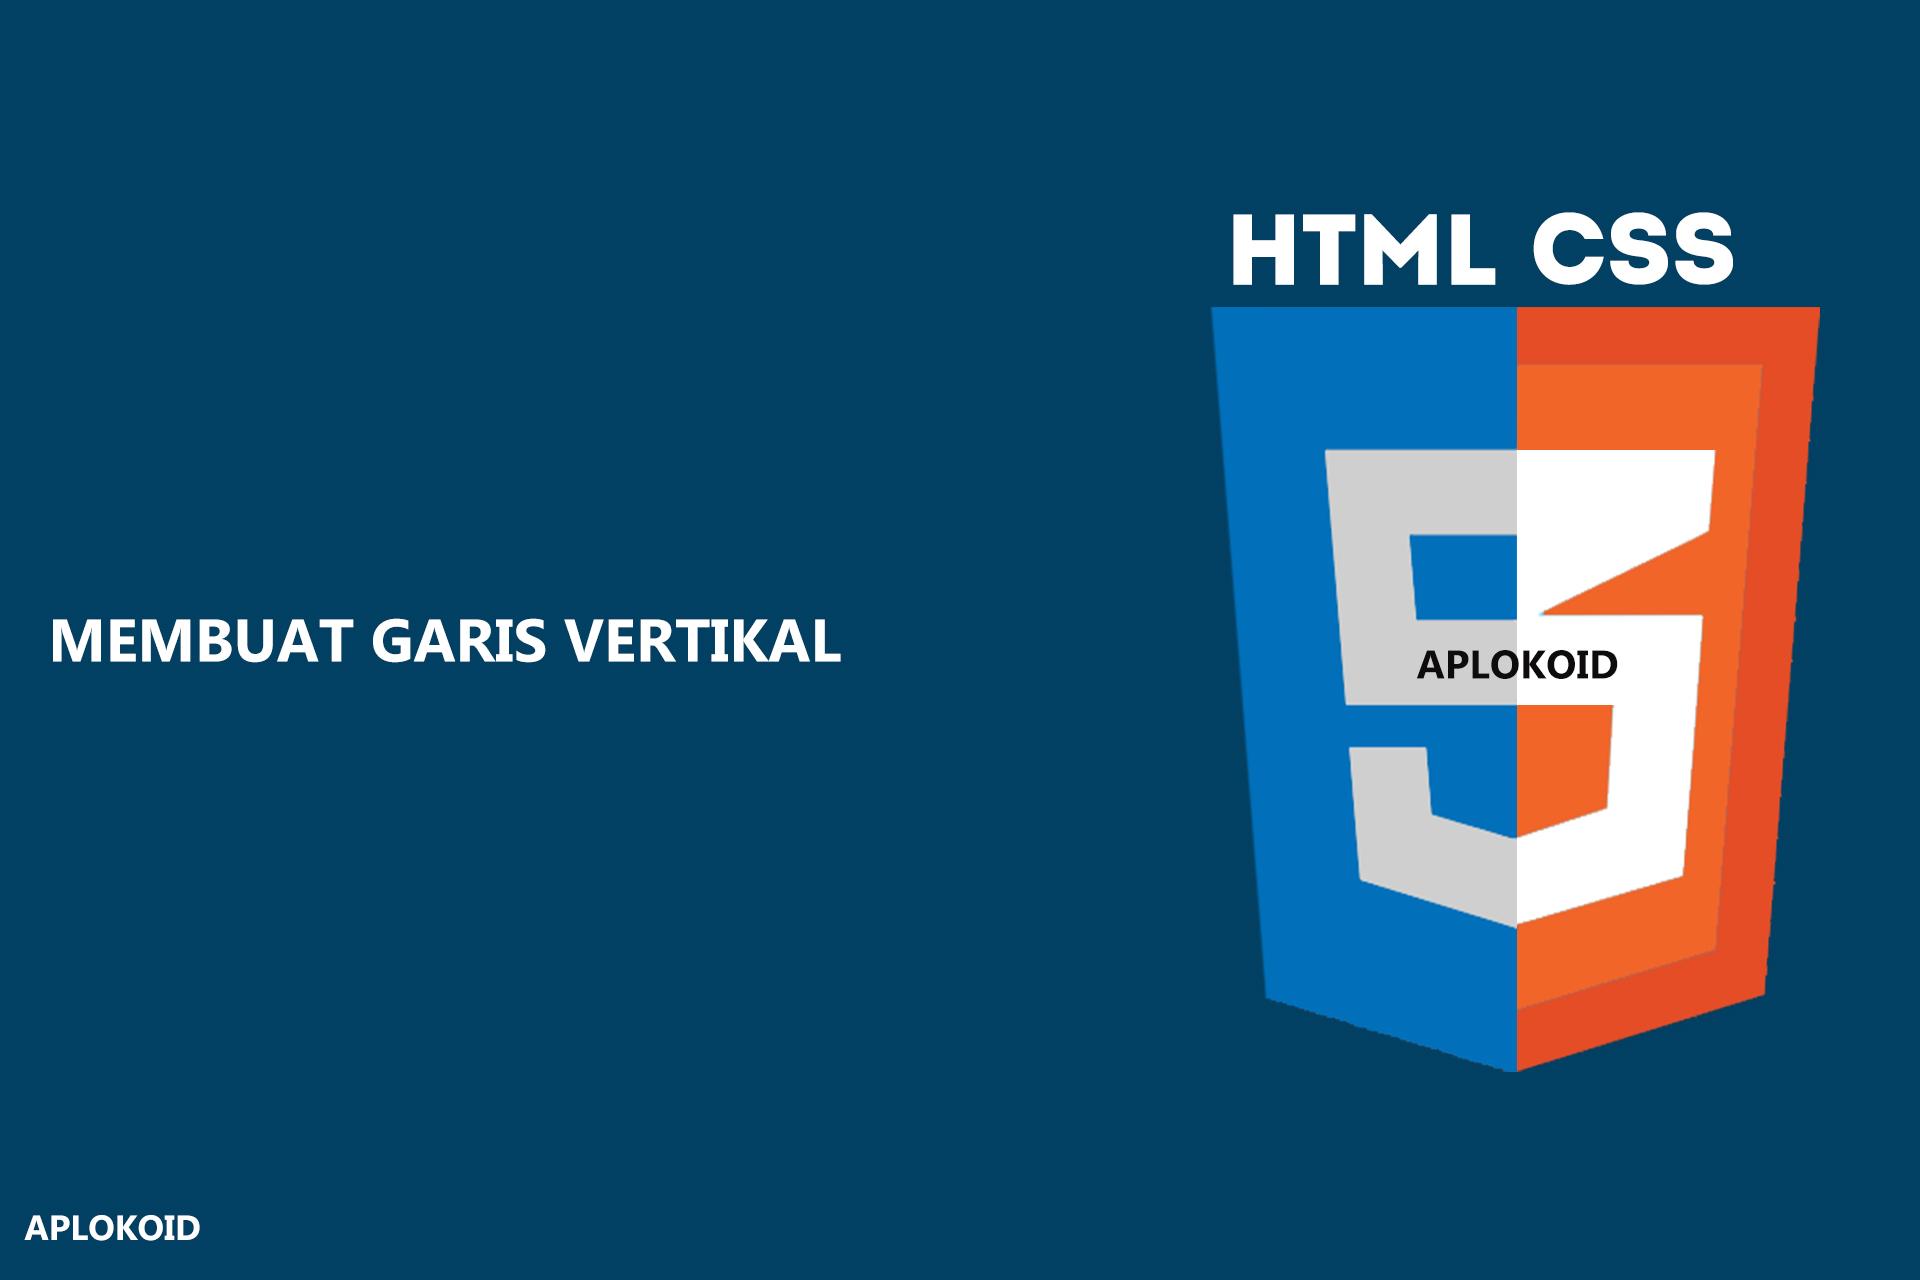 Cara Membuat Garis Vertikal Dengan HTML dan CSSCara Membuat Garis Vertikal Dengan HTML dan CSS